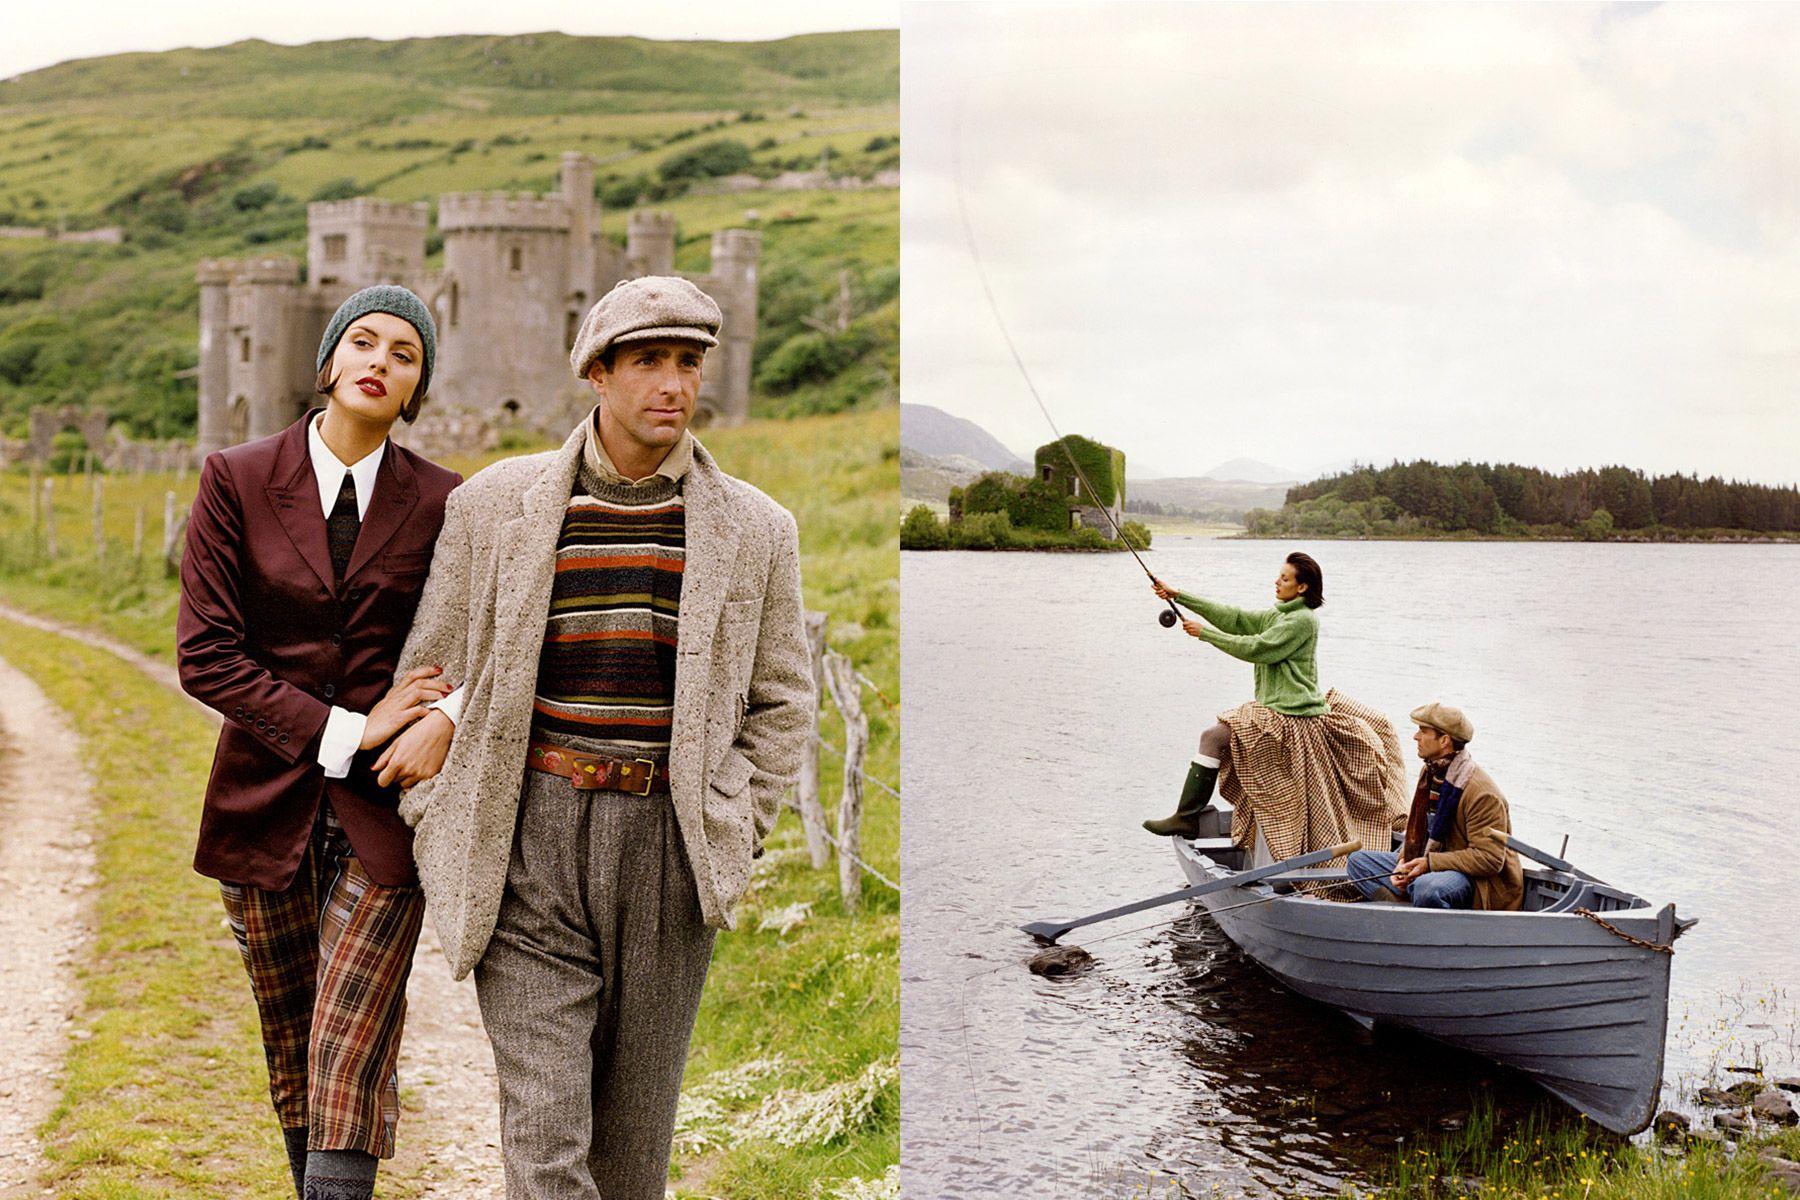 Conde_Nast_Traveler_Ireland_1994_dblpg_2.jpg